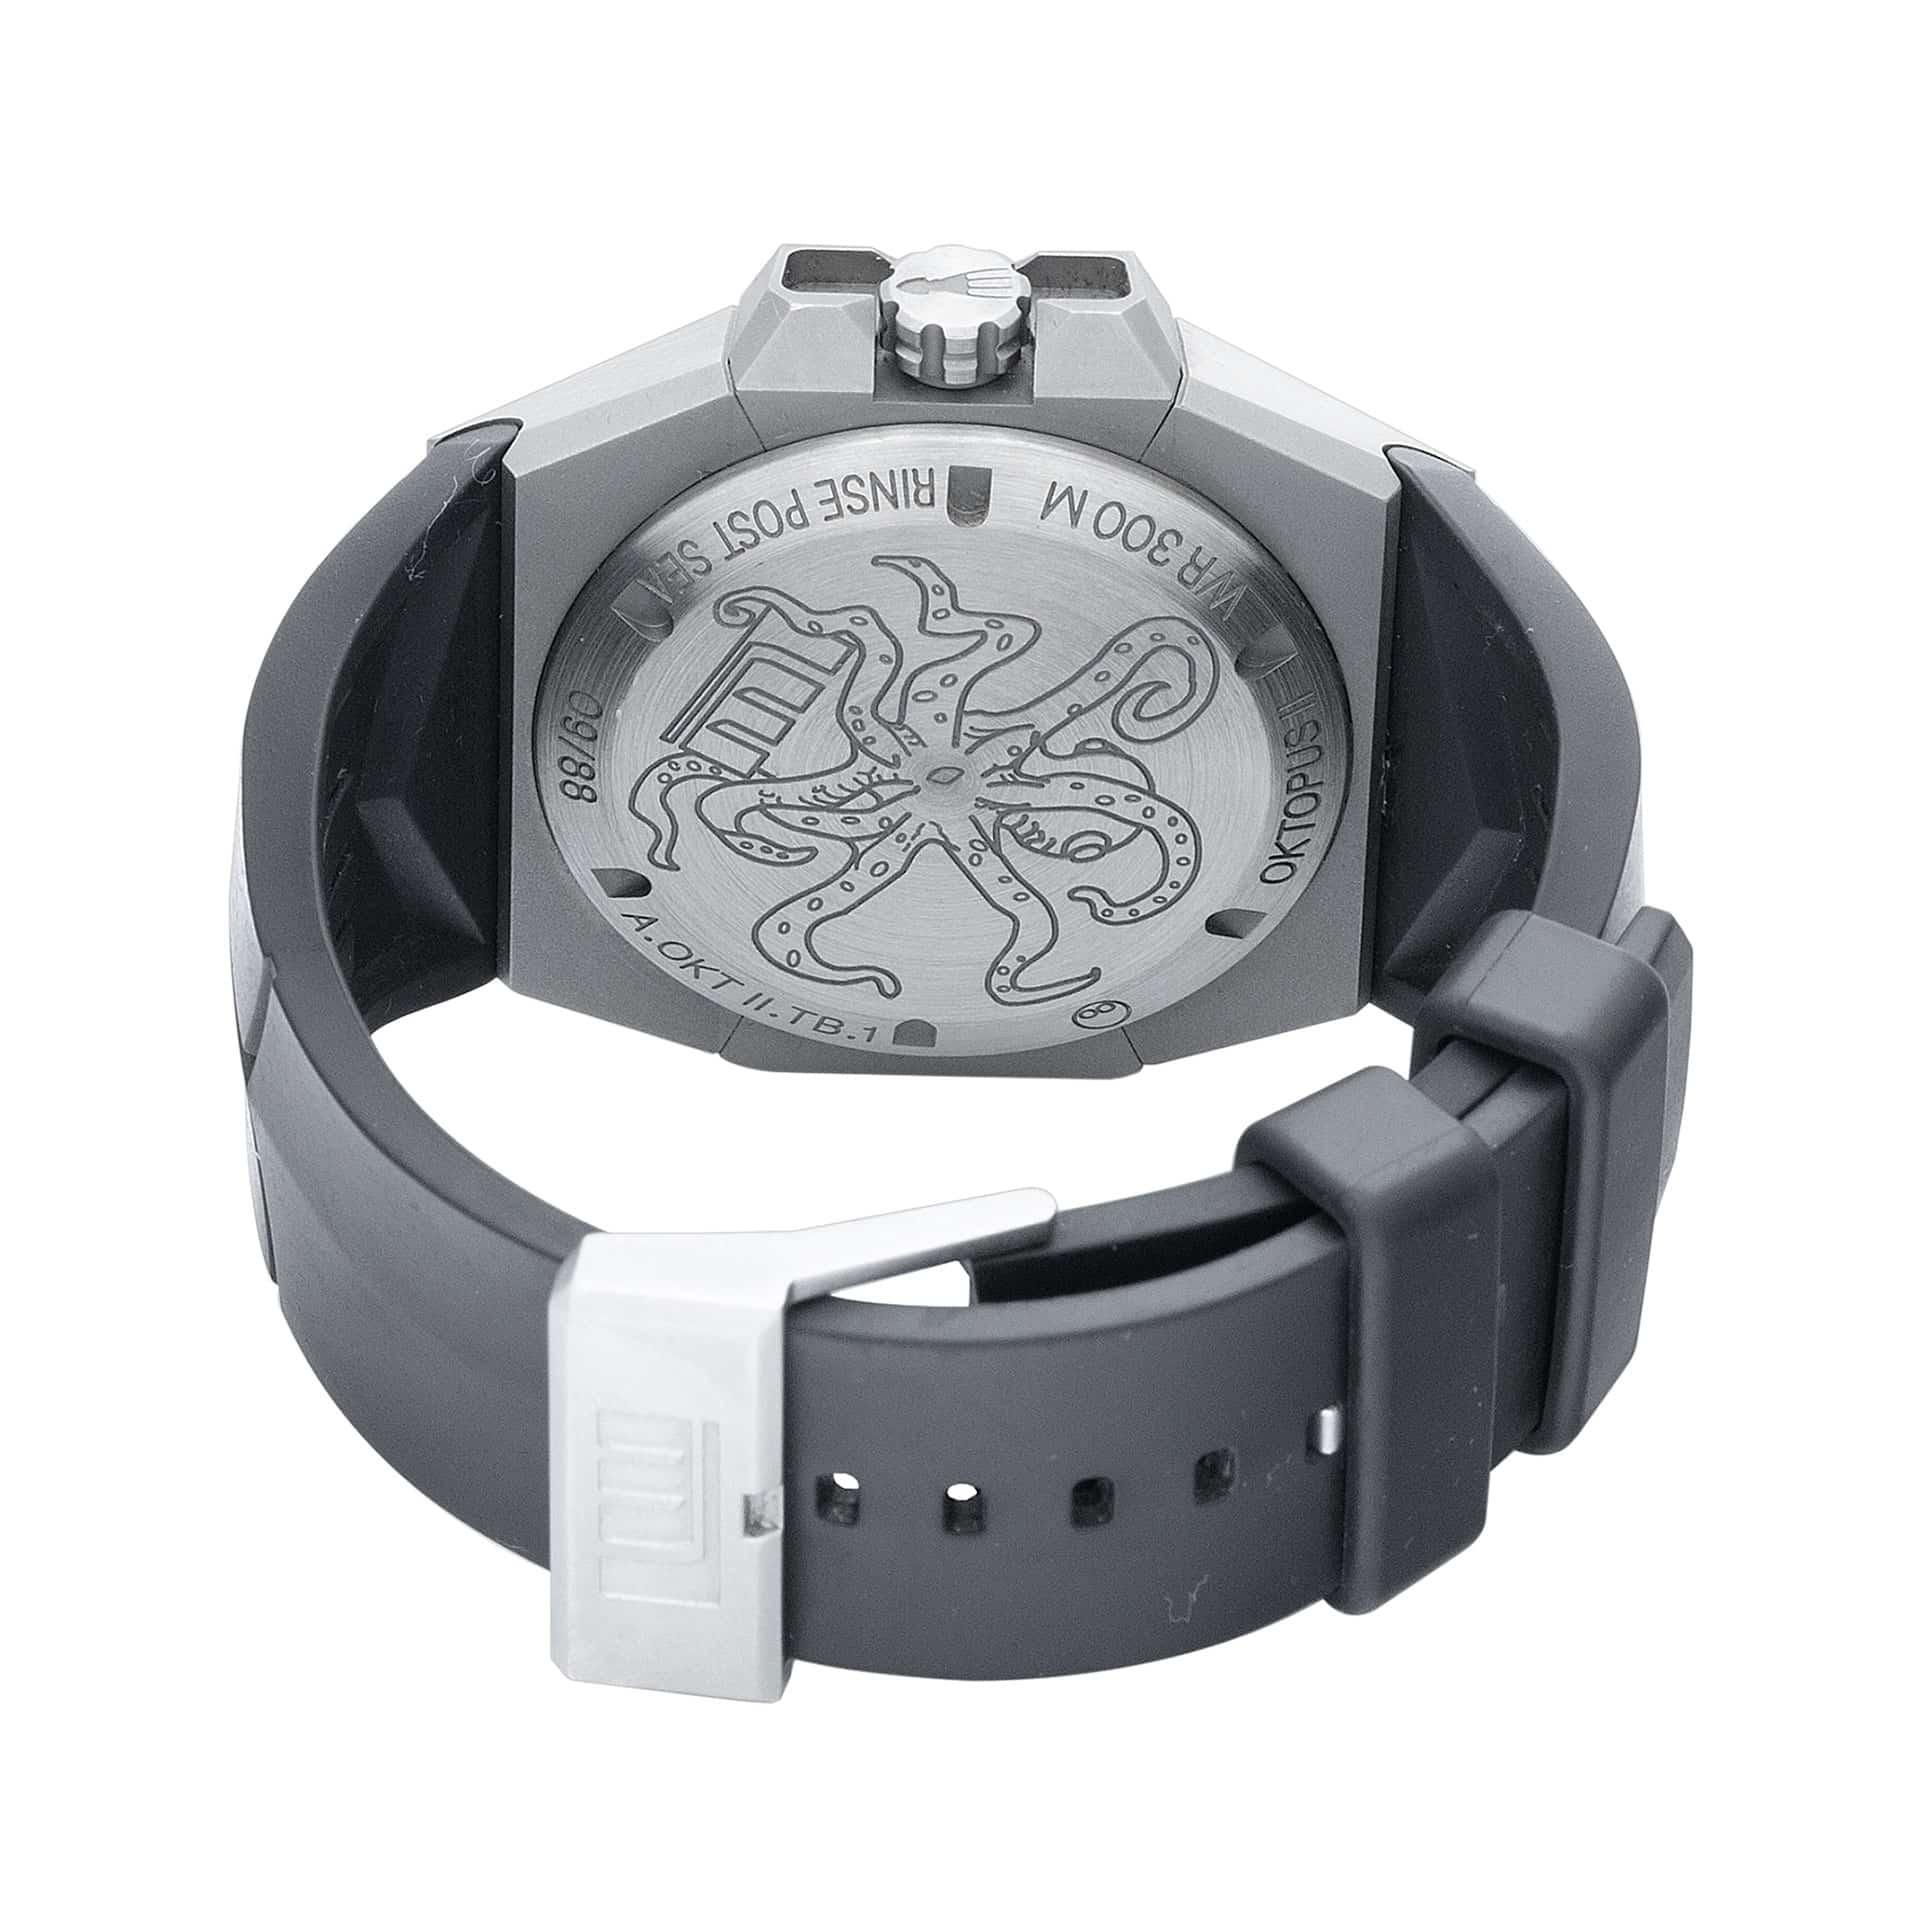 Linde Werdelin Oktopus Double Date Blue Watch